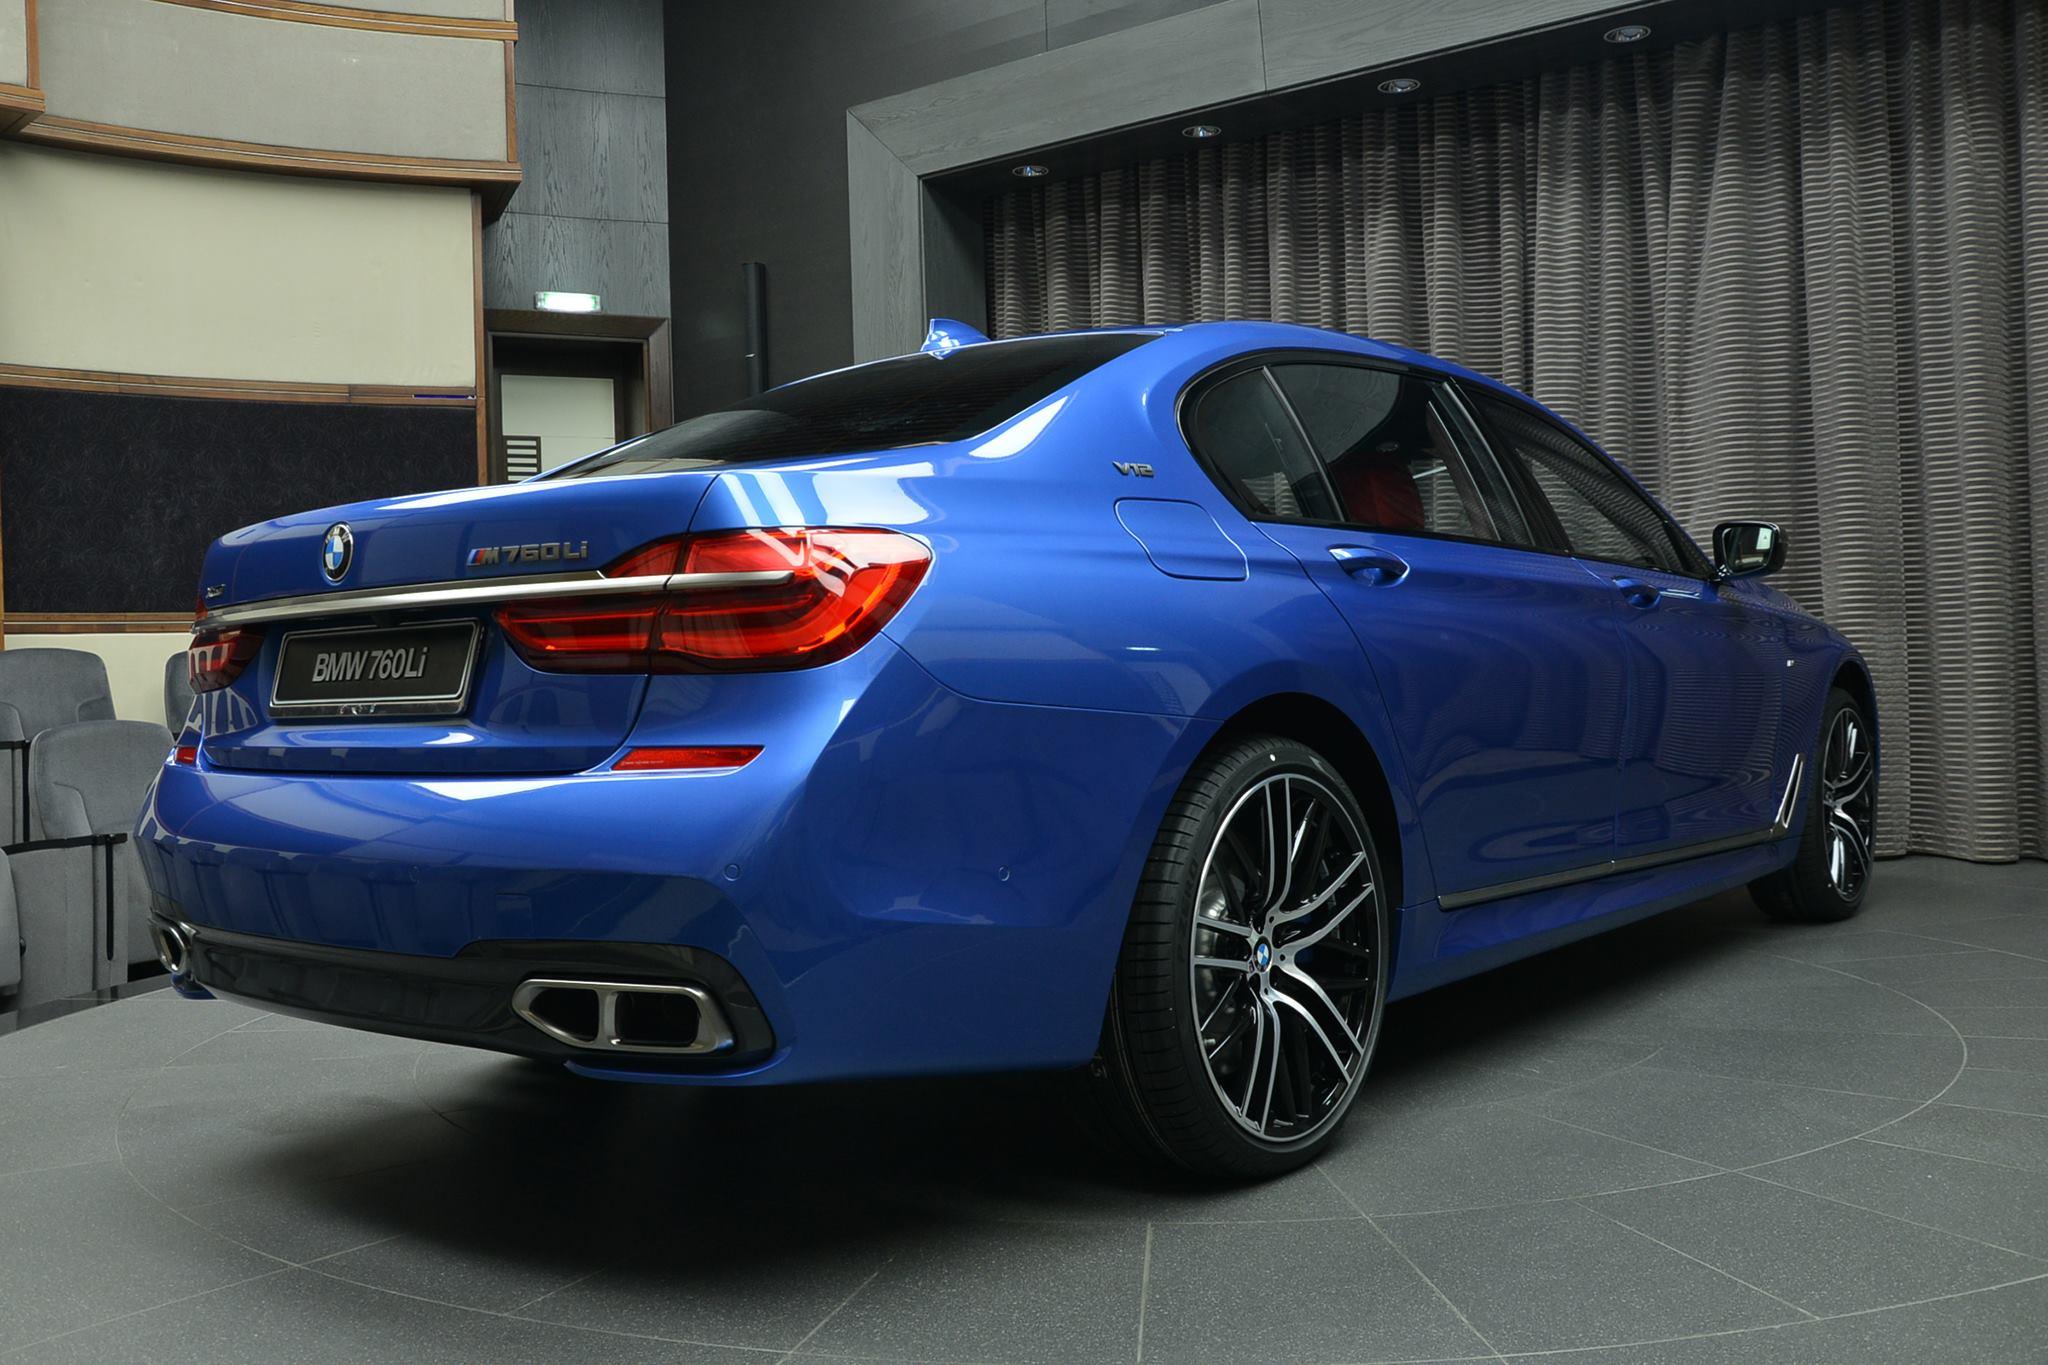 Bmw M760li Xdrive V12 With Individual Paint Estoril Blue